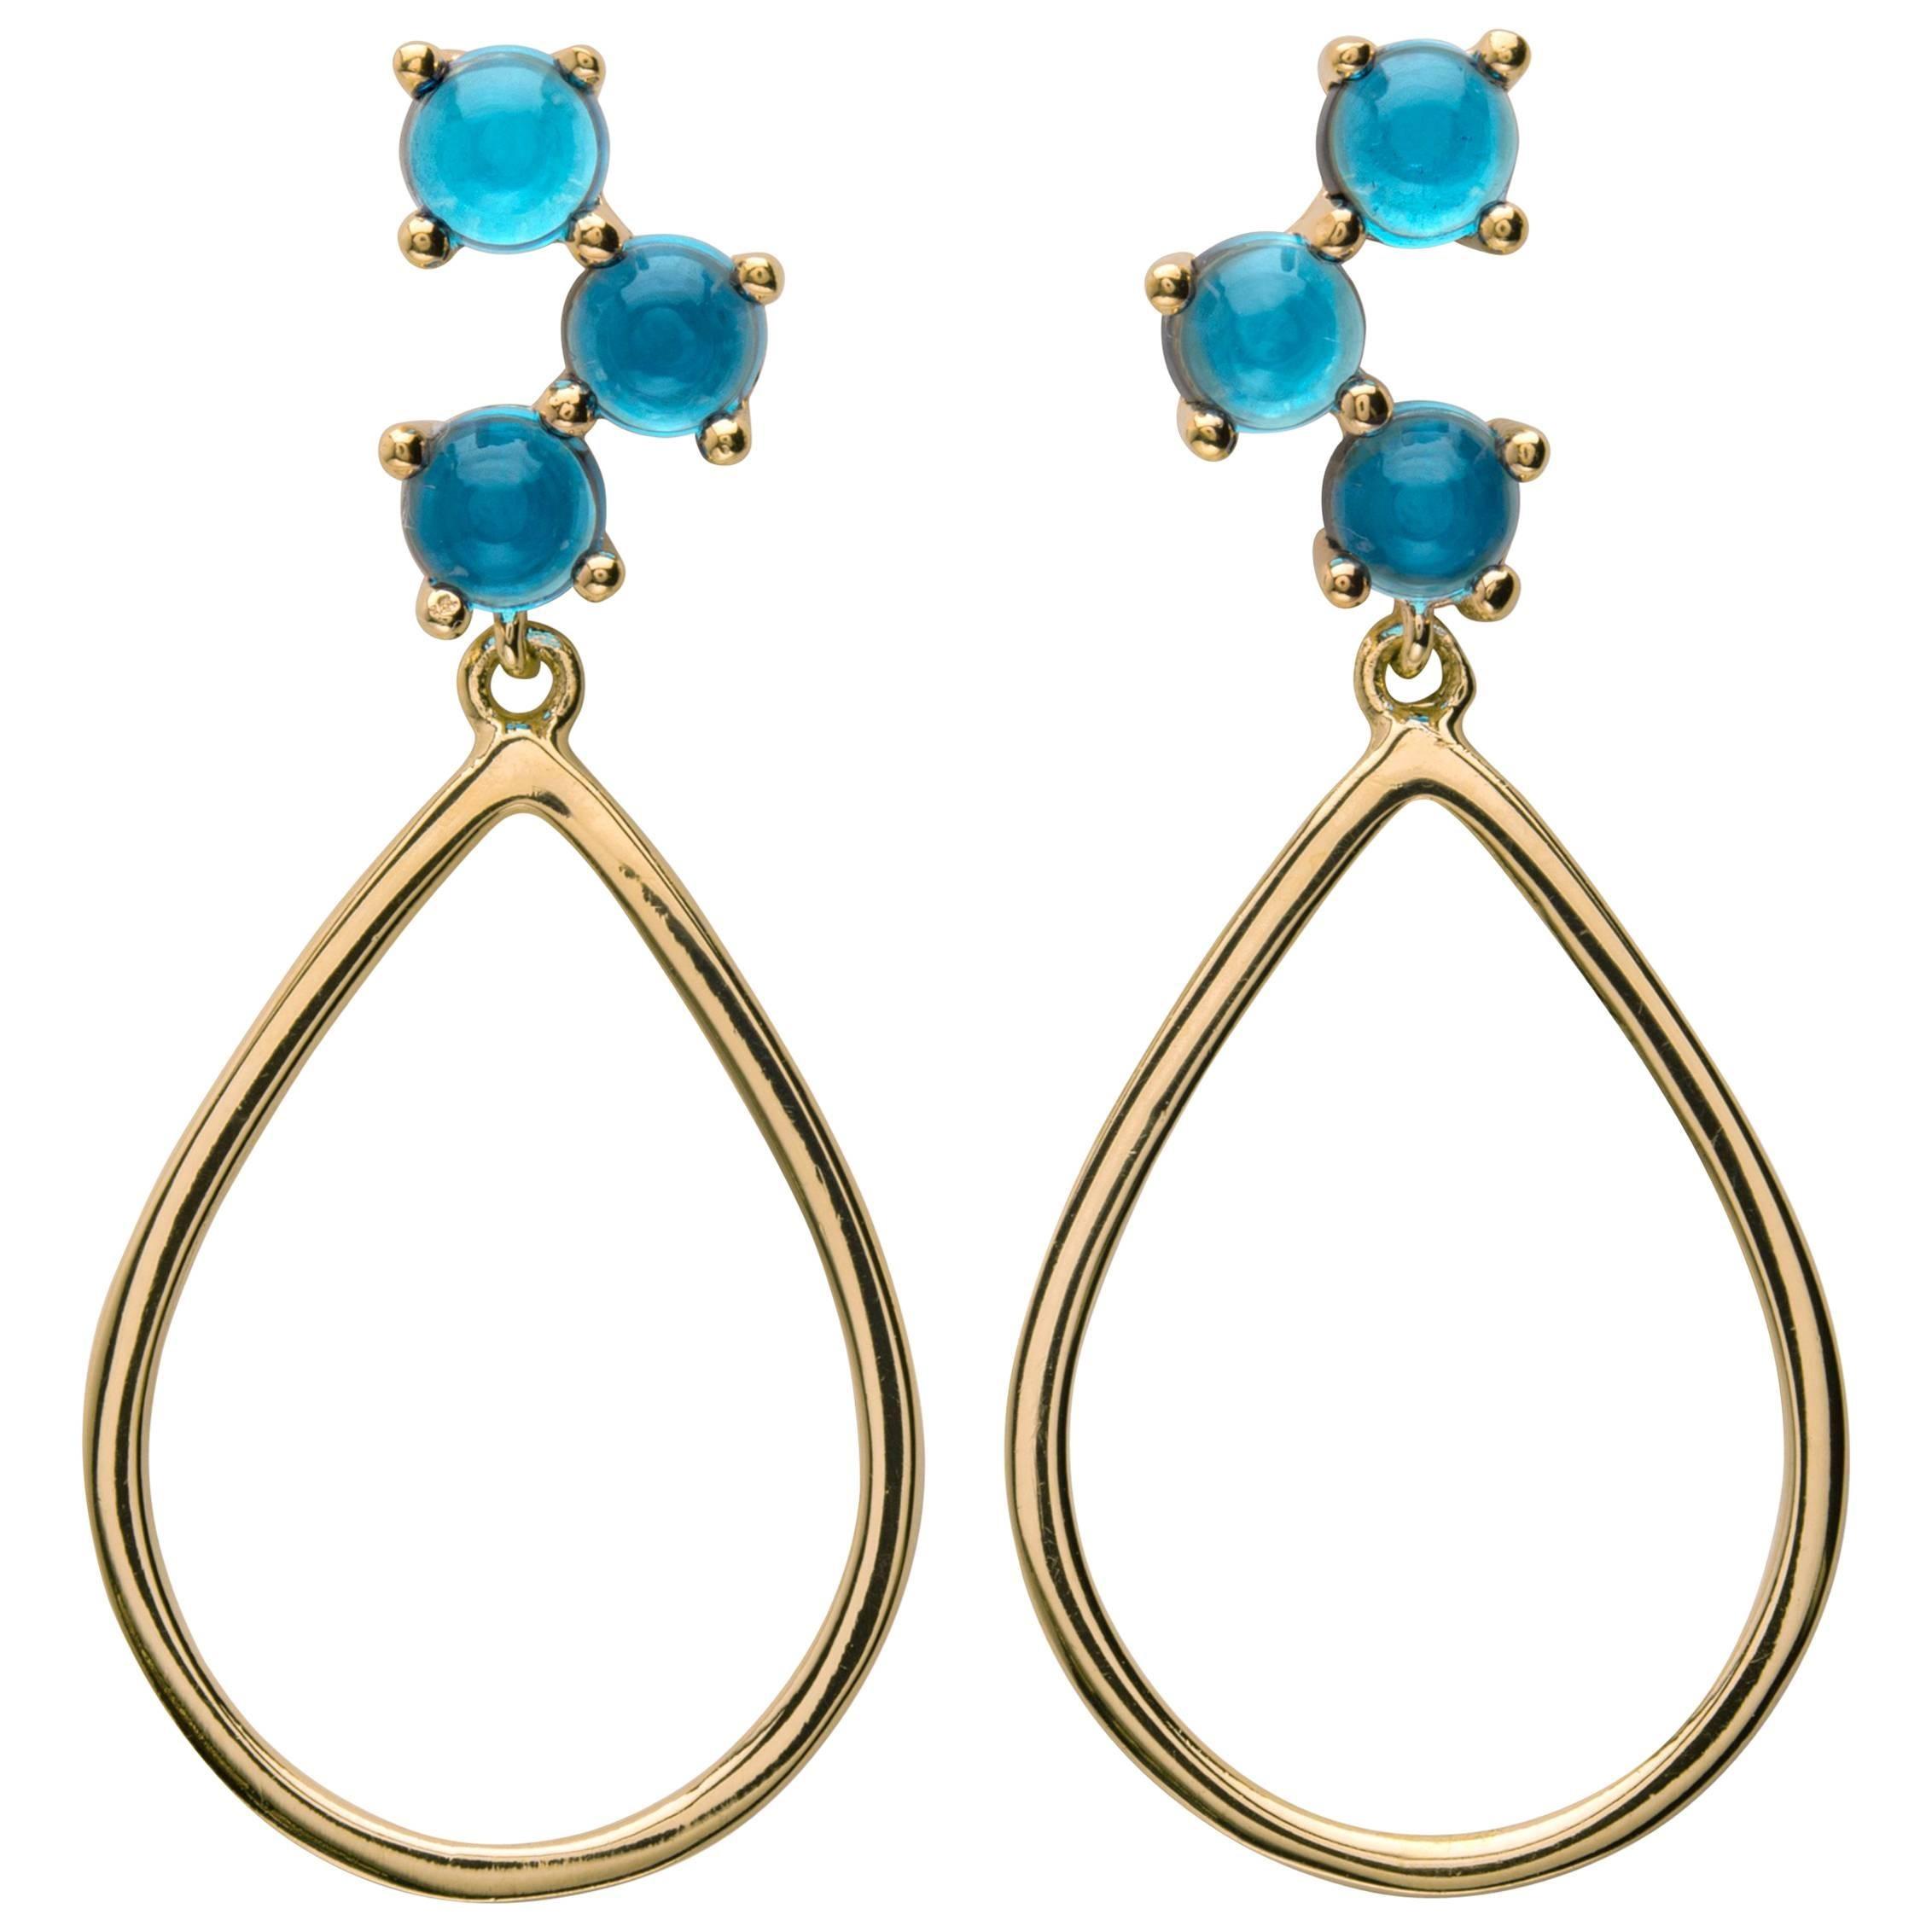 18kt yellow gold london blue silver Vermeil classic modern hoop drop Earrings